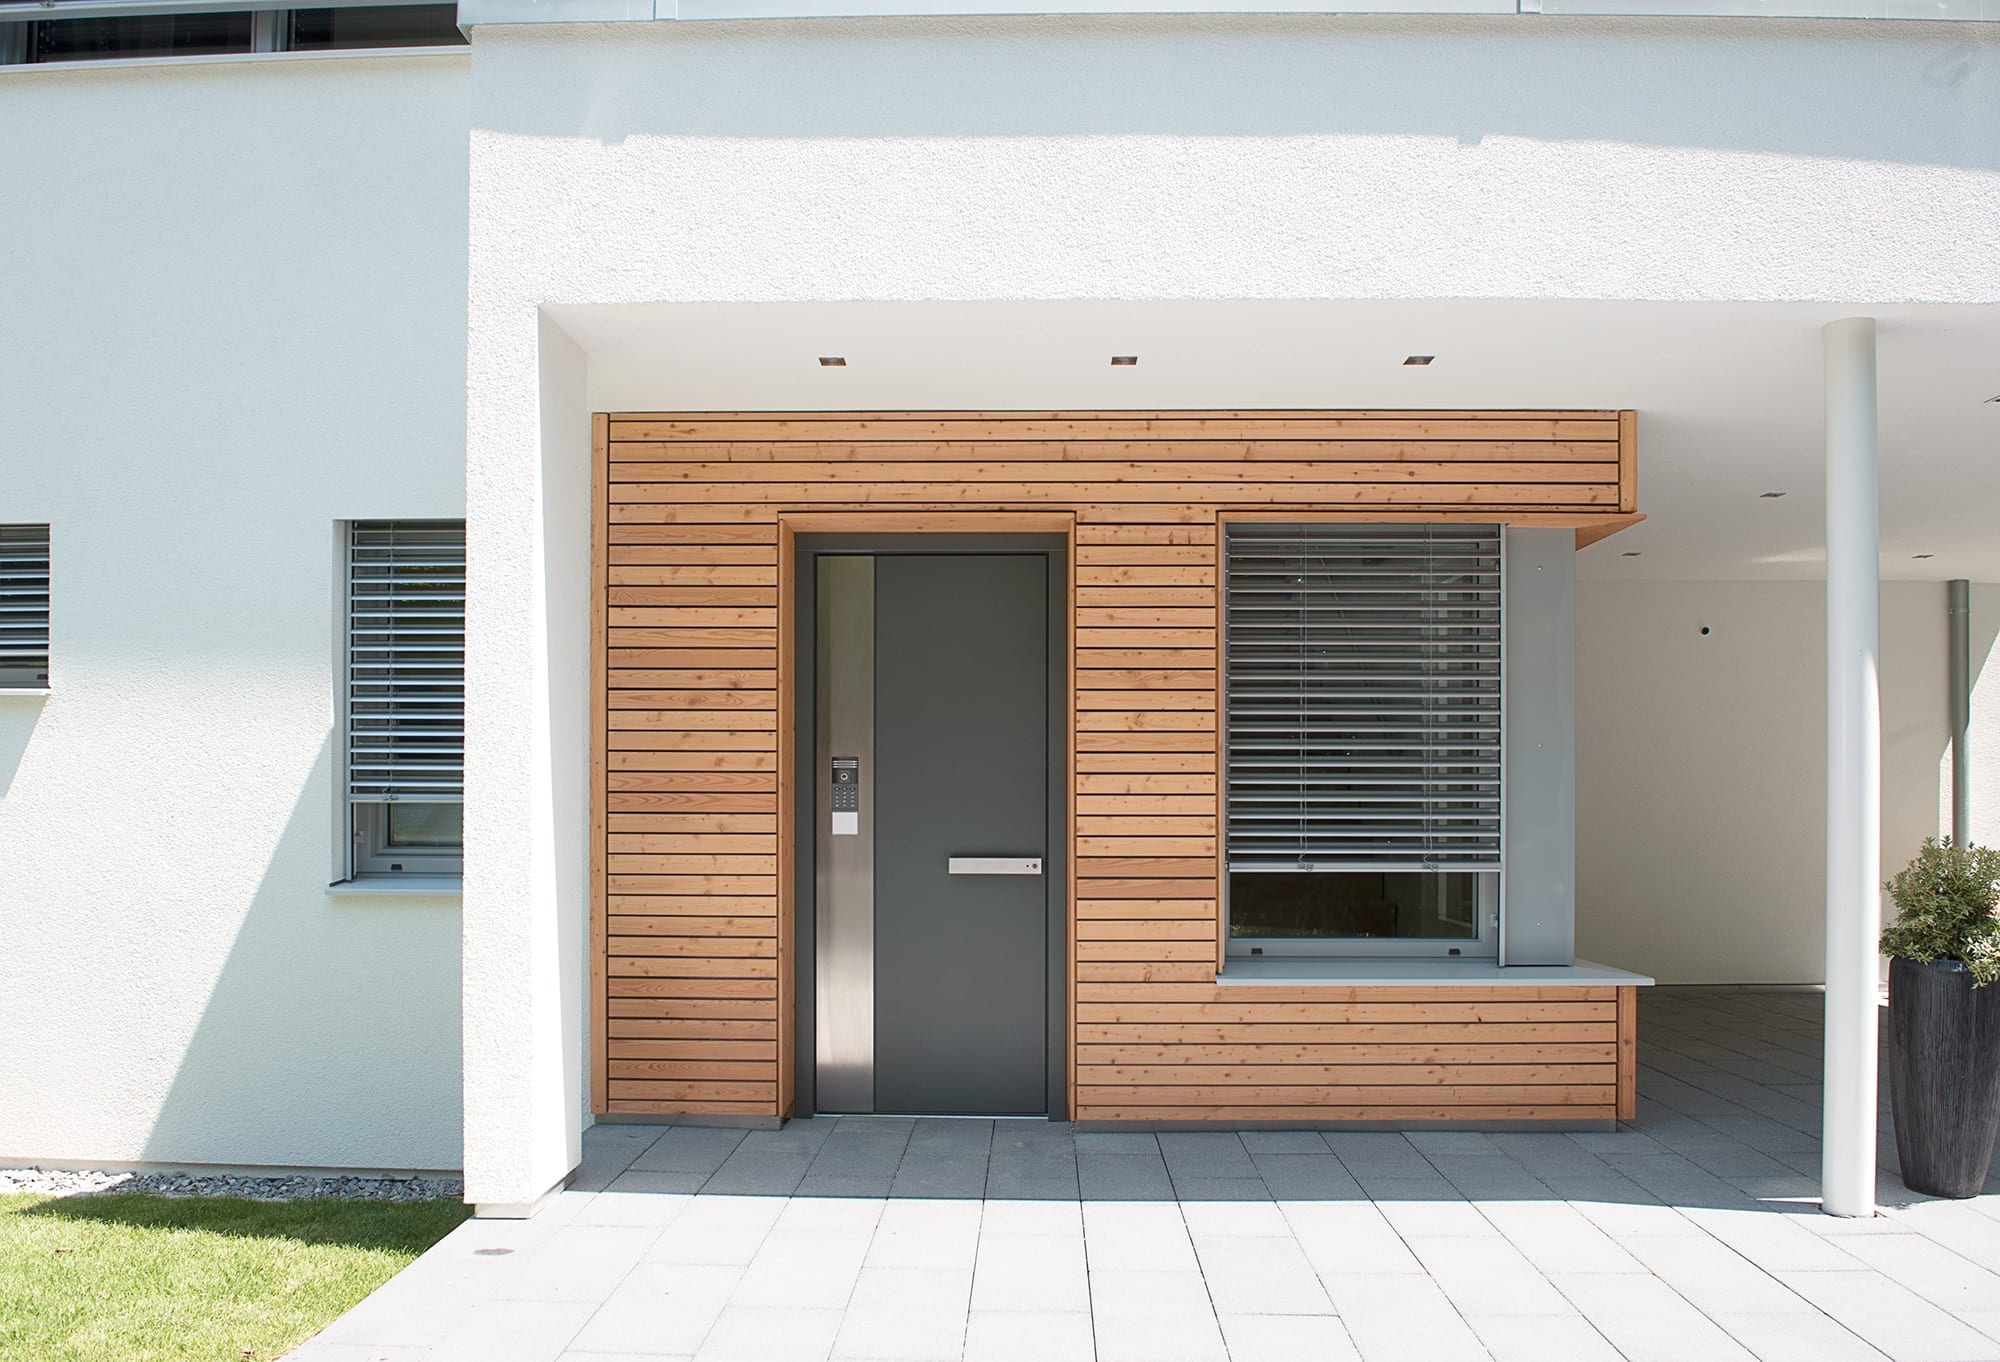 Entrance Doors Residential : Residential doors kÖmmerling